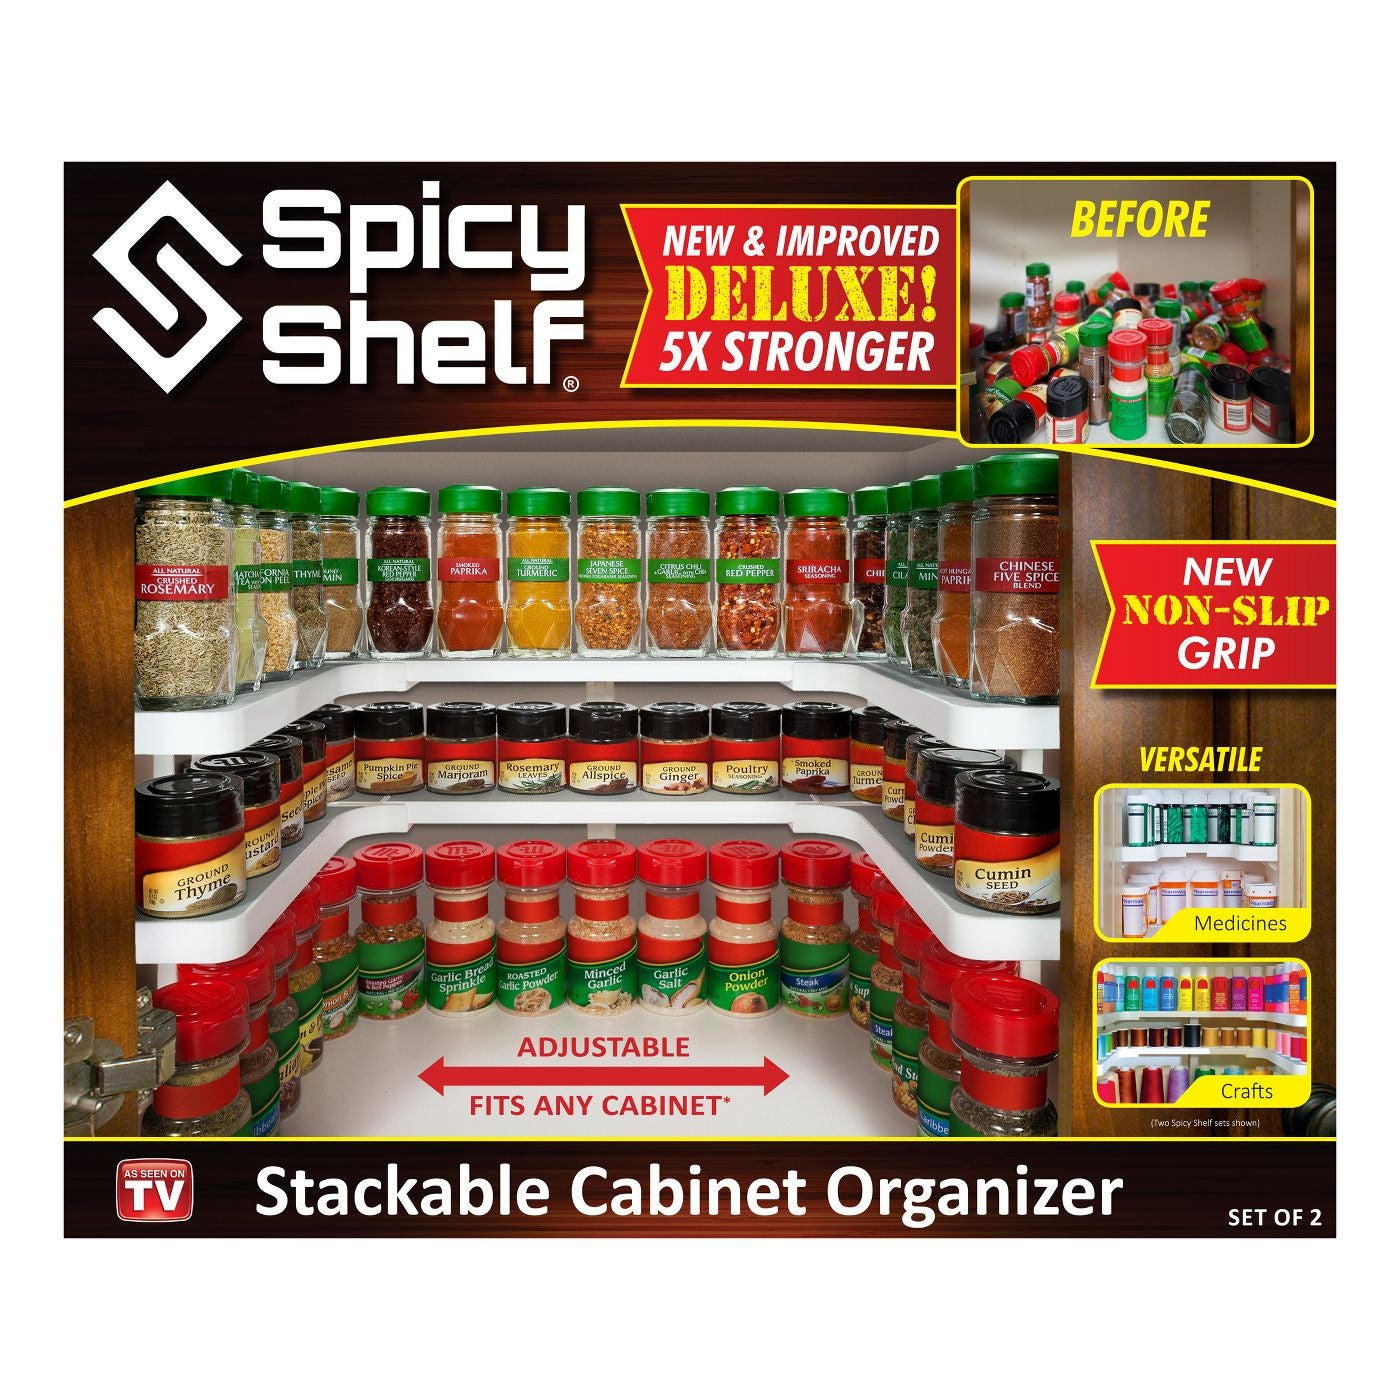 the three-row spicy shelf